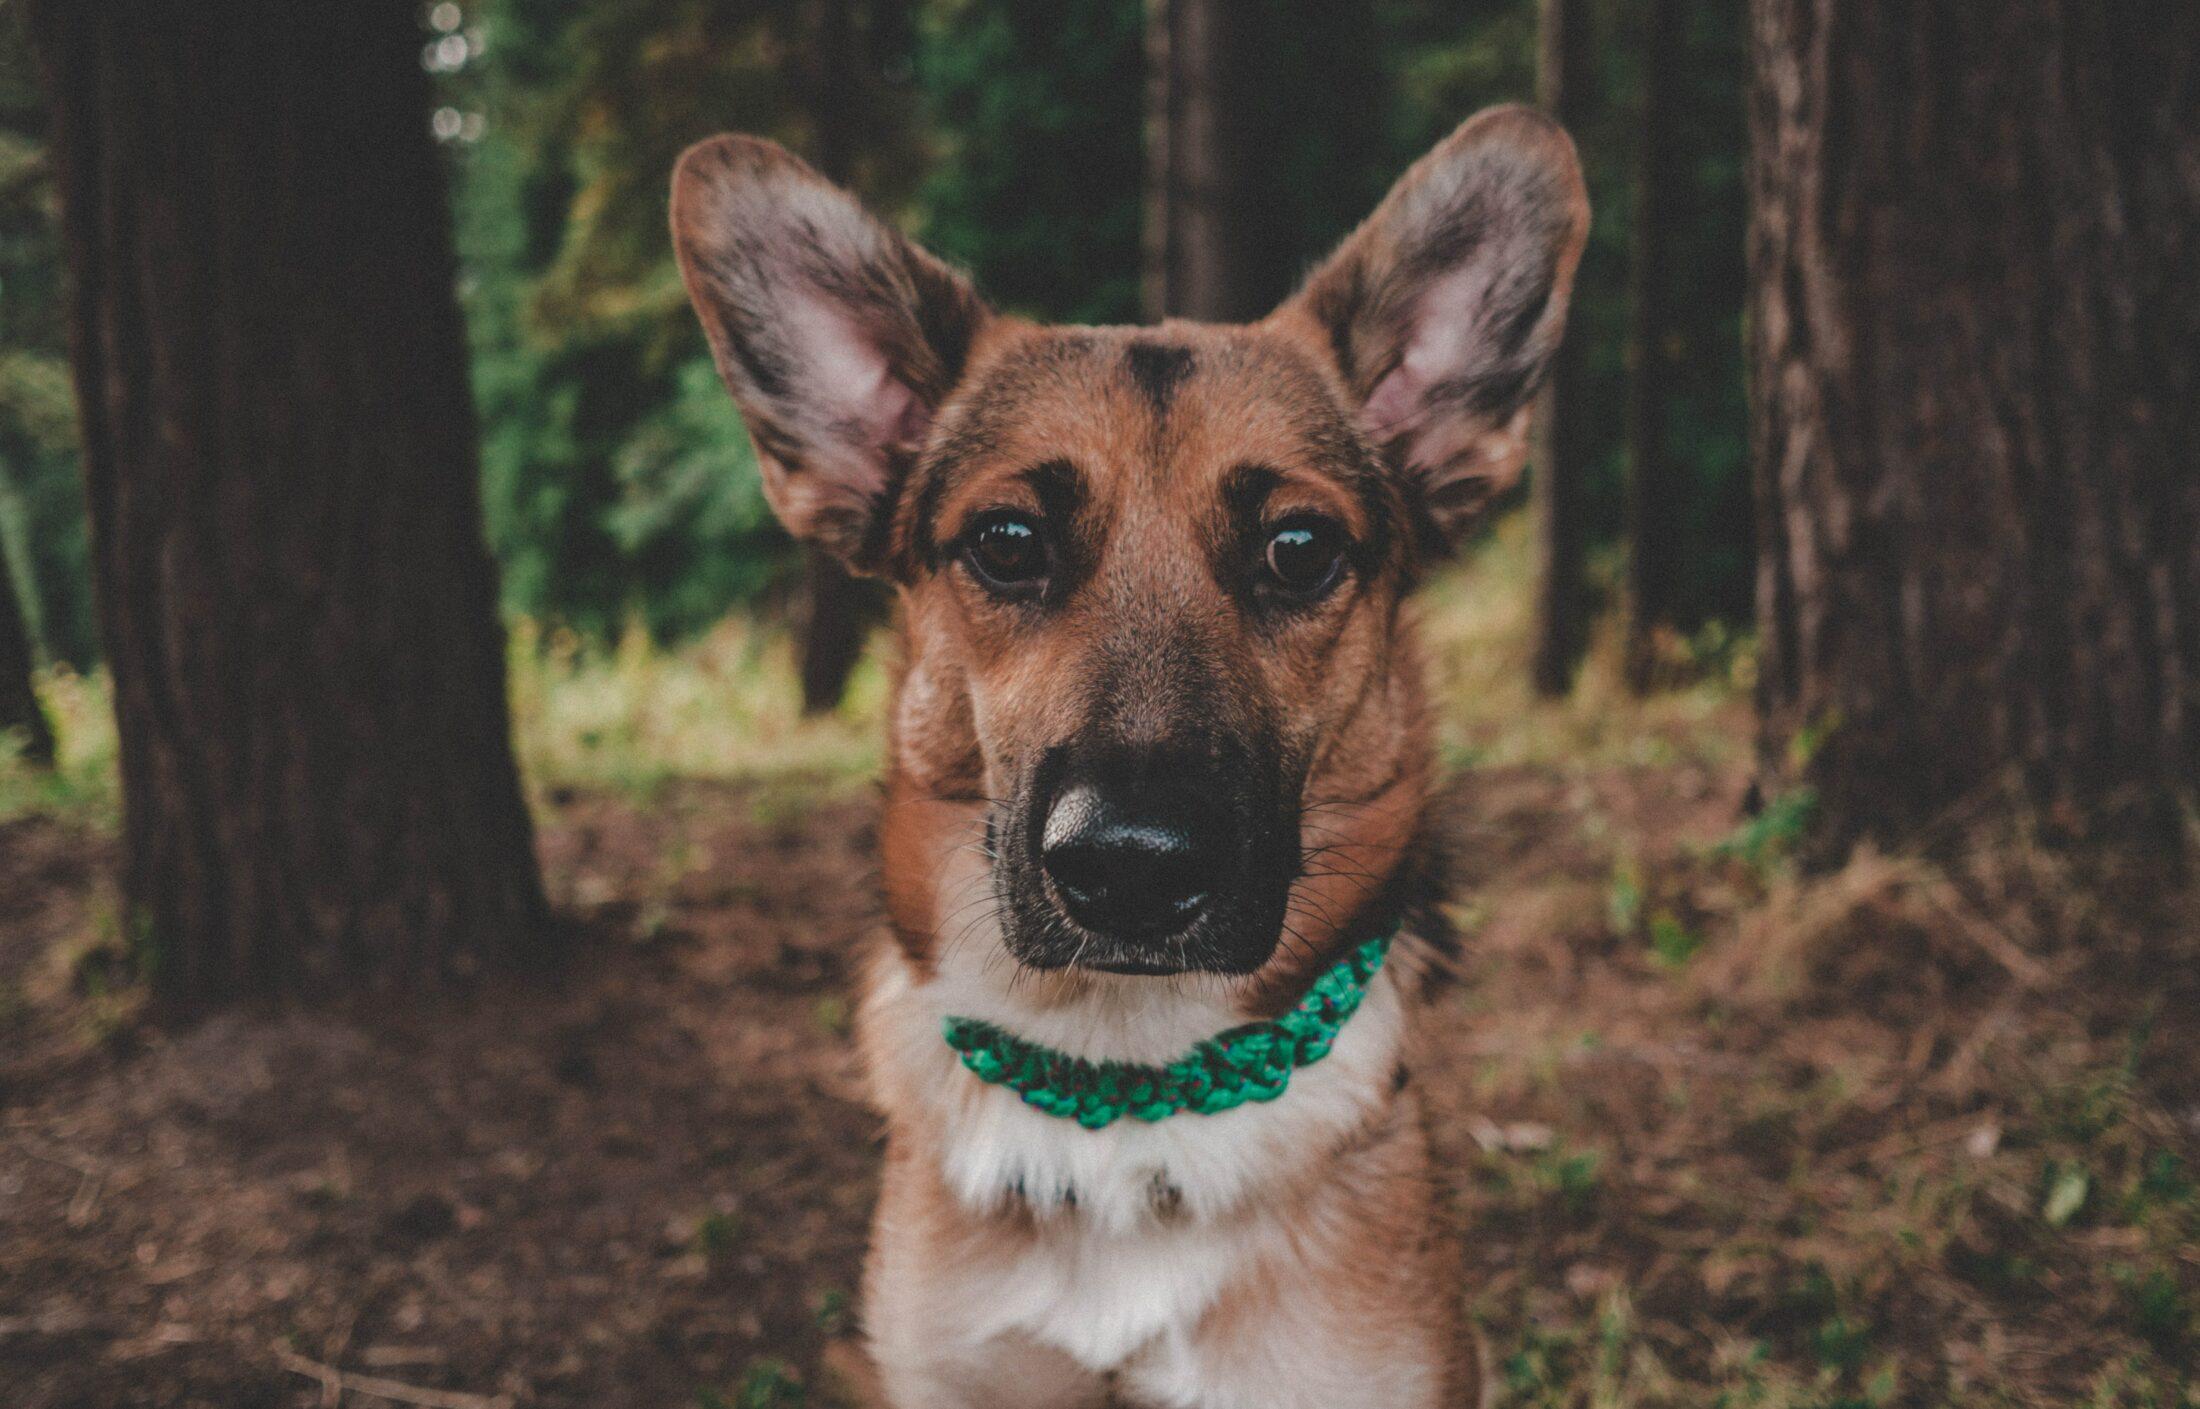 Cachorro e gato juntos - pastor alemao